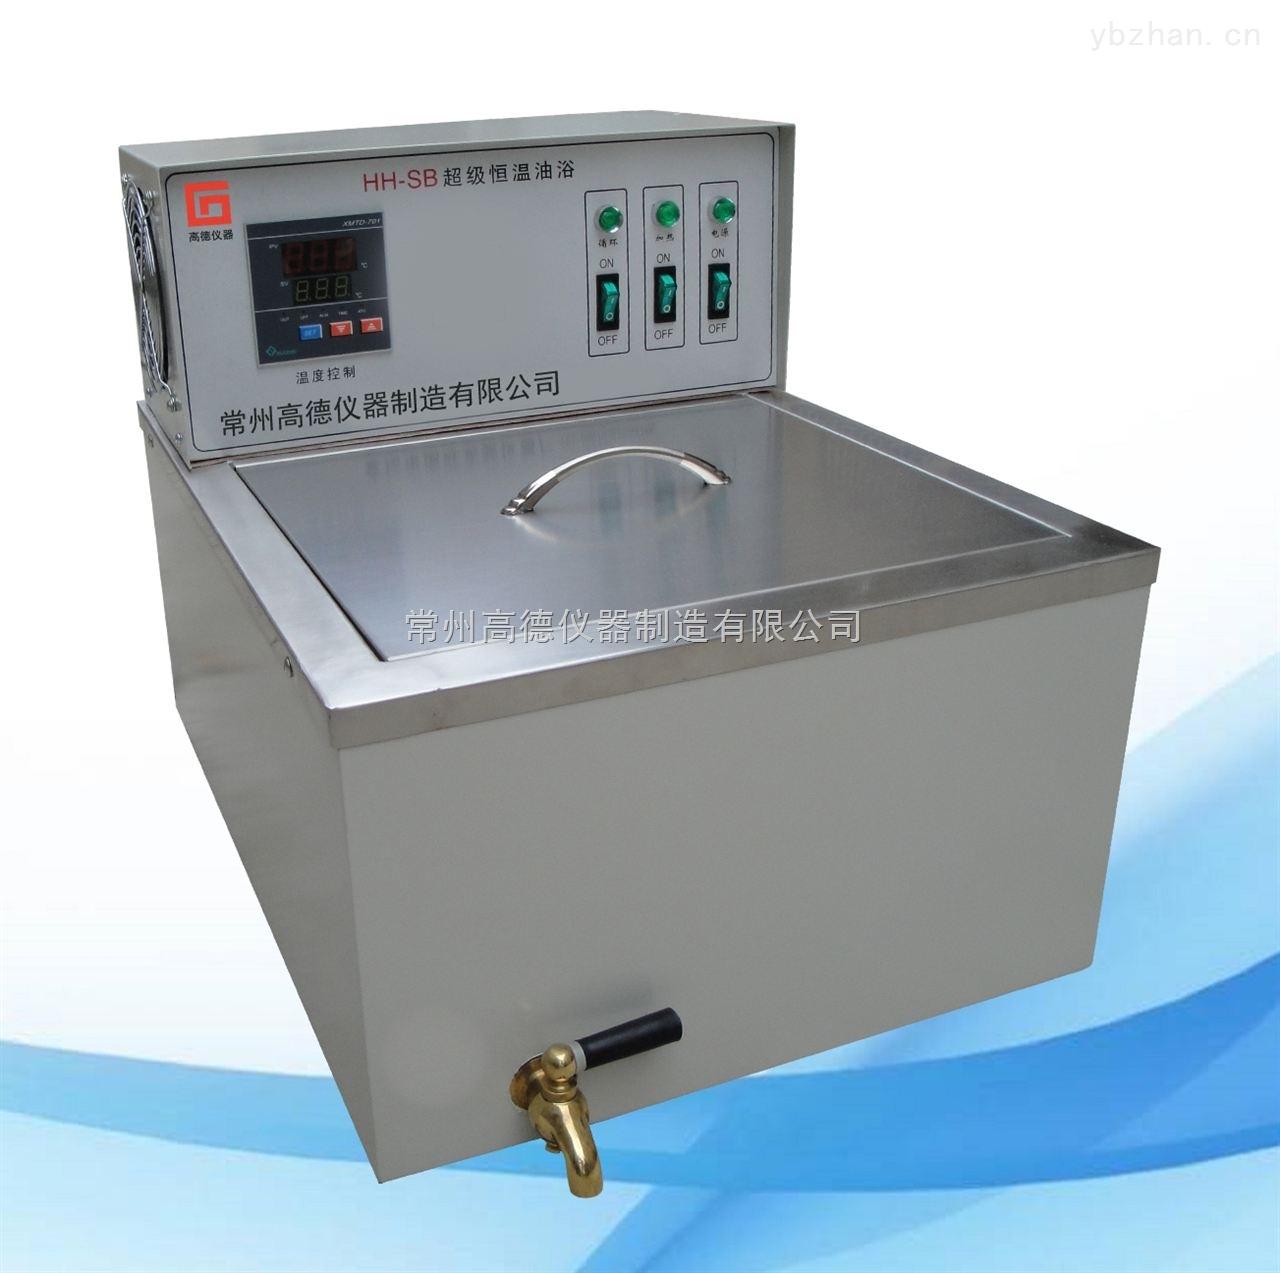 HH-SB-外循環超級恒溫油浴鍋